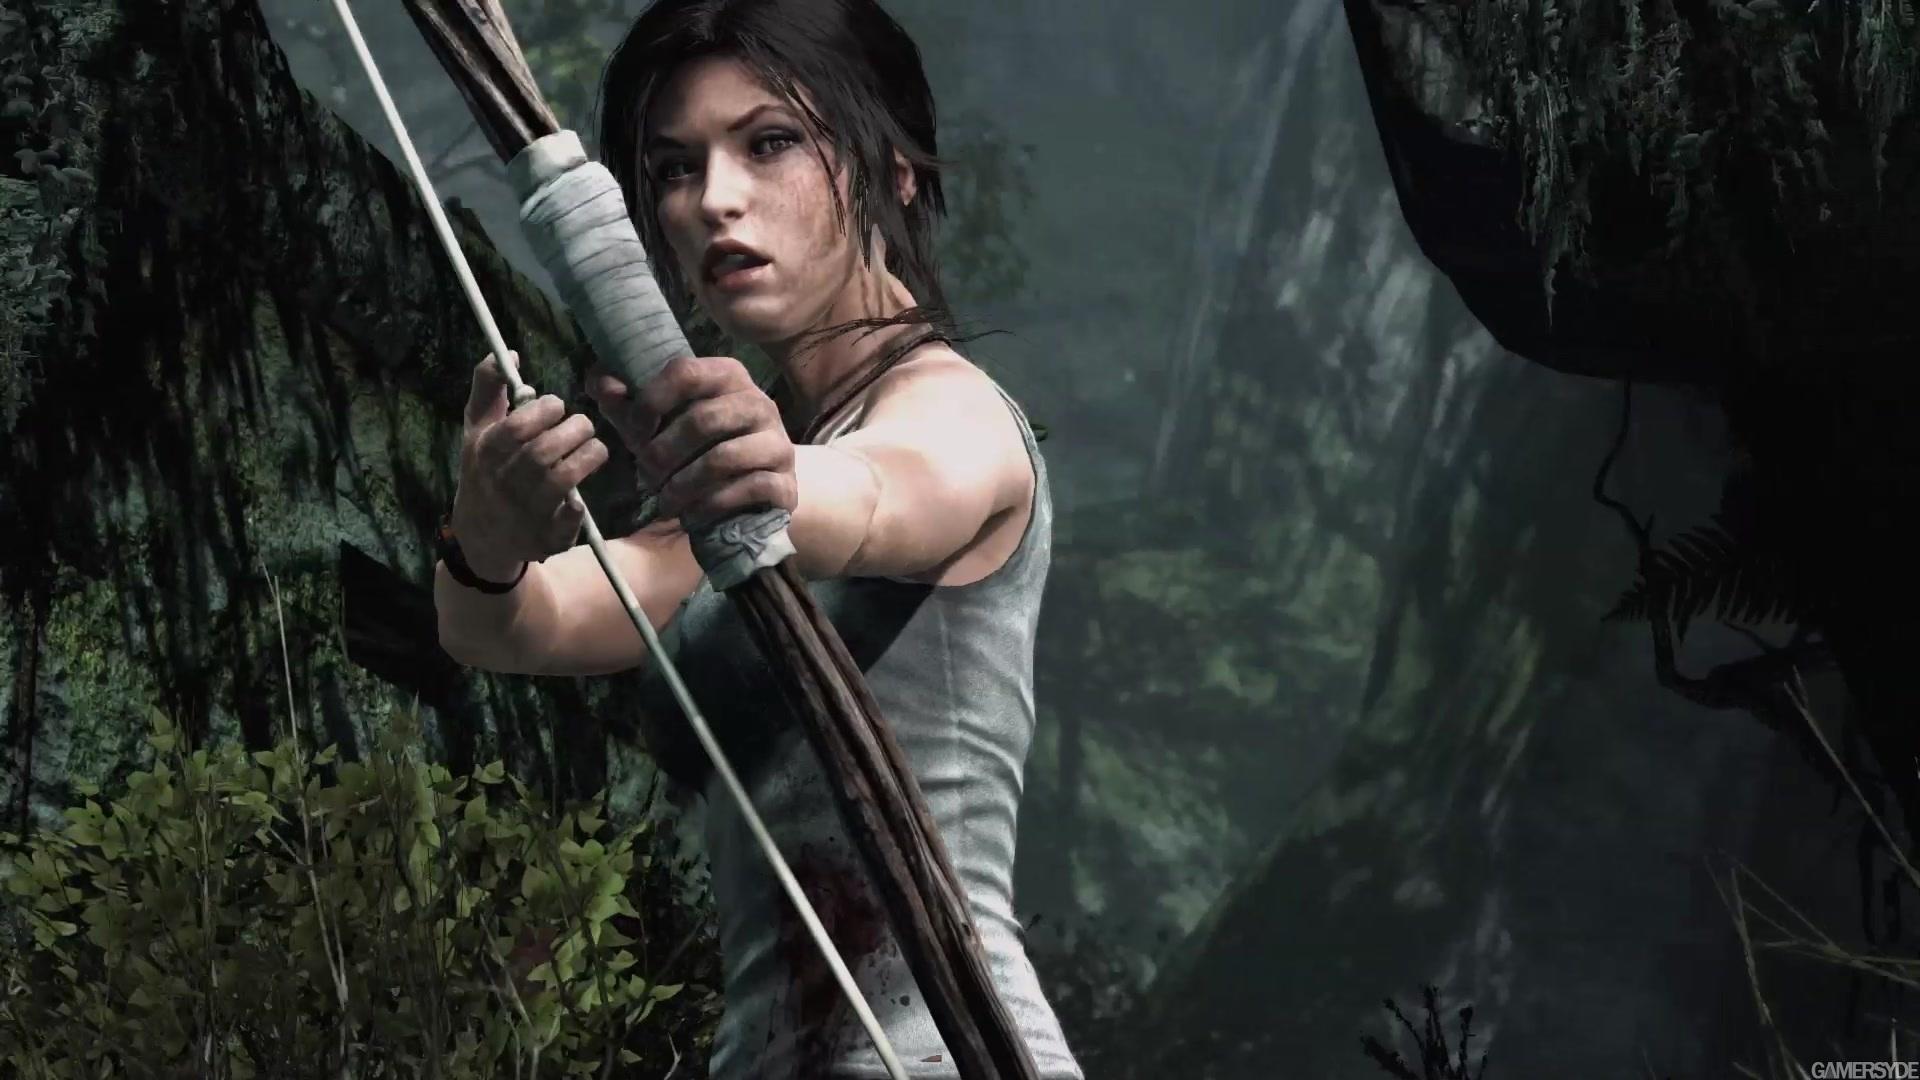 image tomb raider 24052 1912 0006 تصاویر جدیدی از عنوان Tomb Raider: Definitive Edition منتشر شد